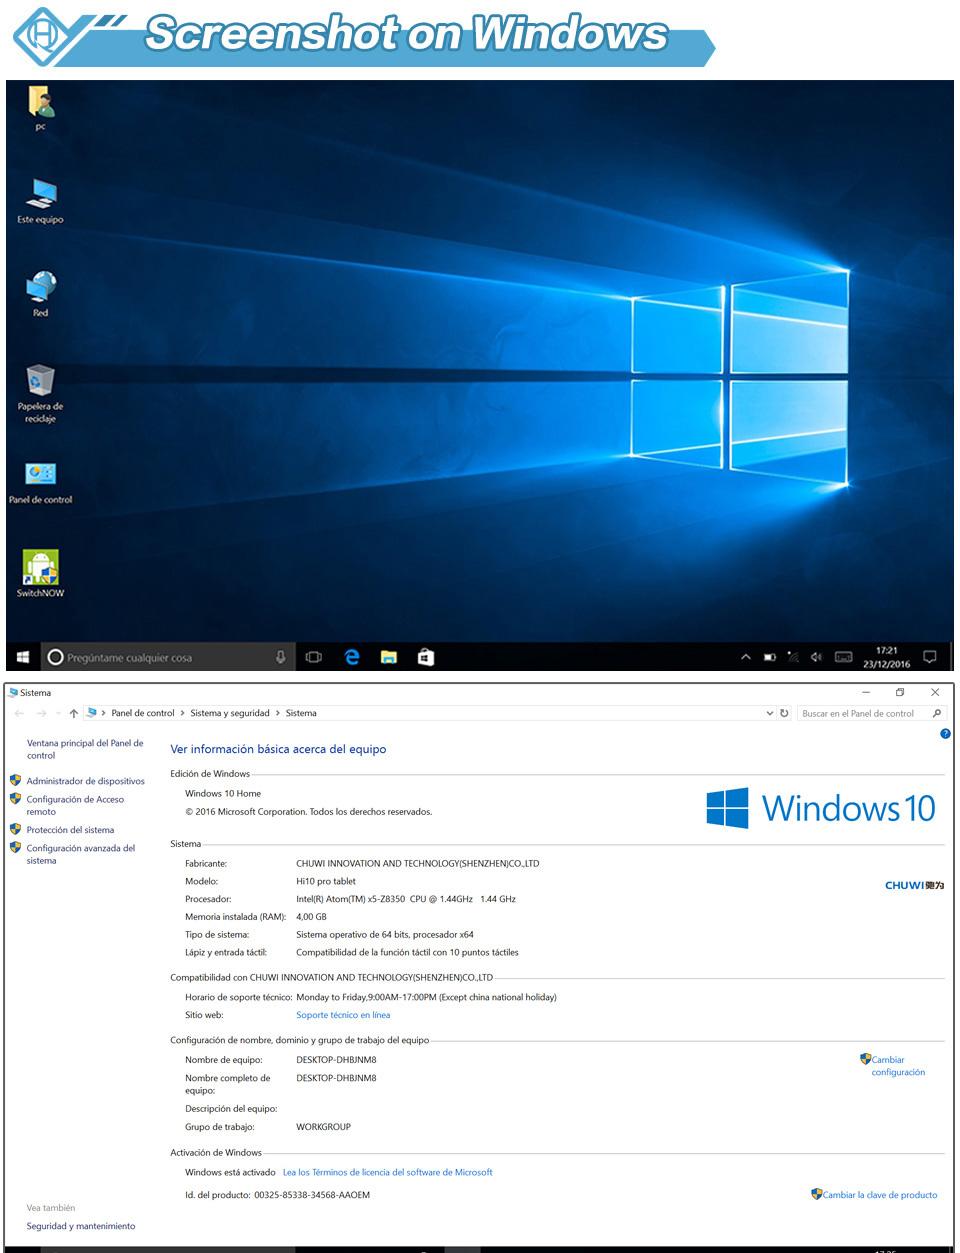 windows 10 2 in 1 -3